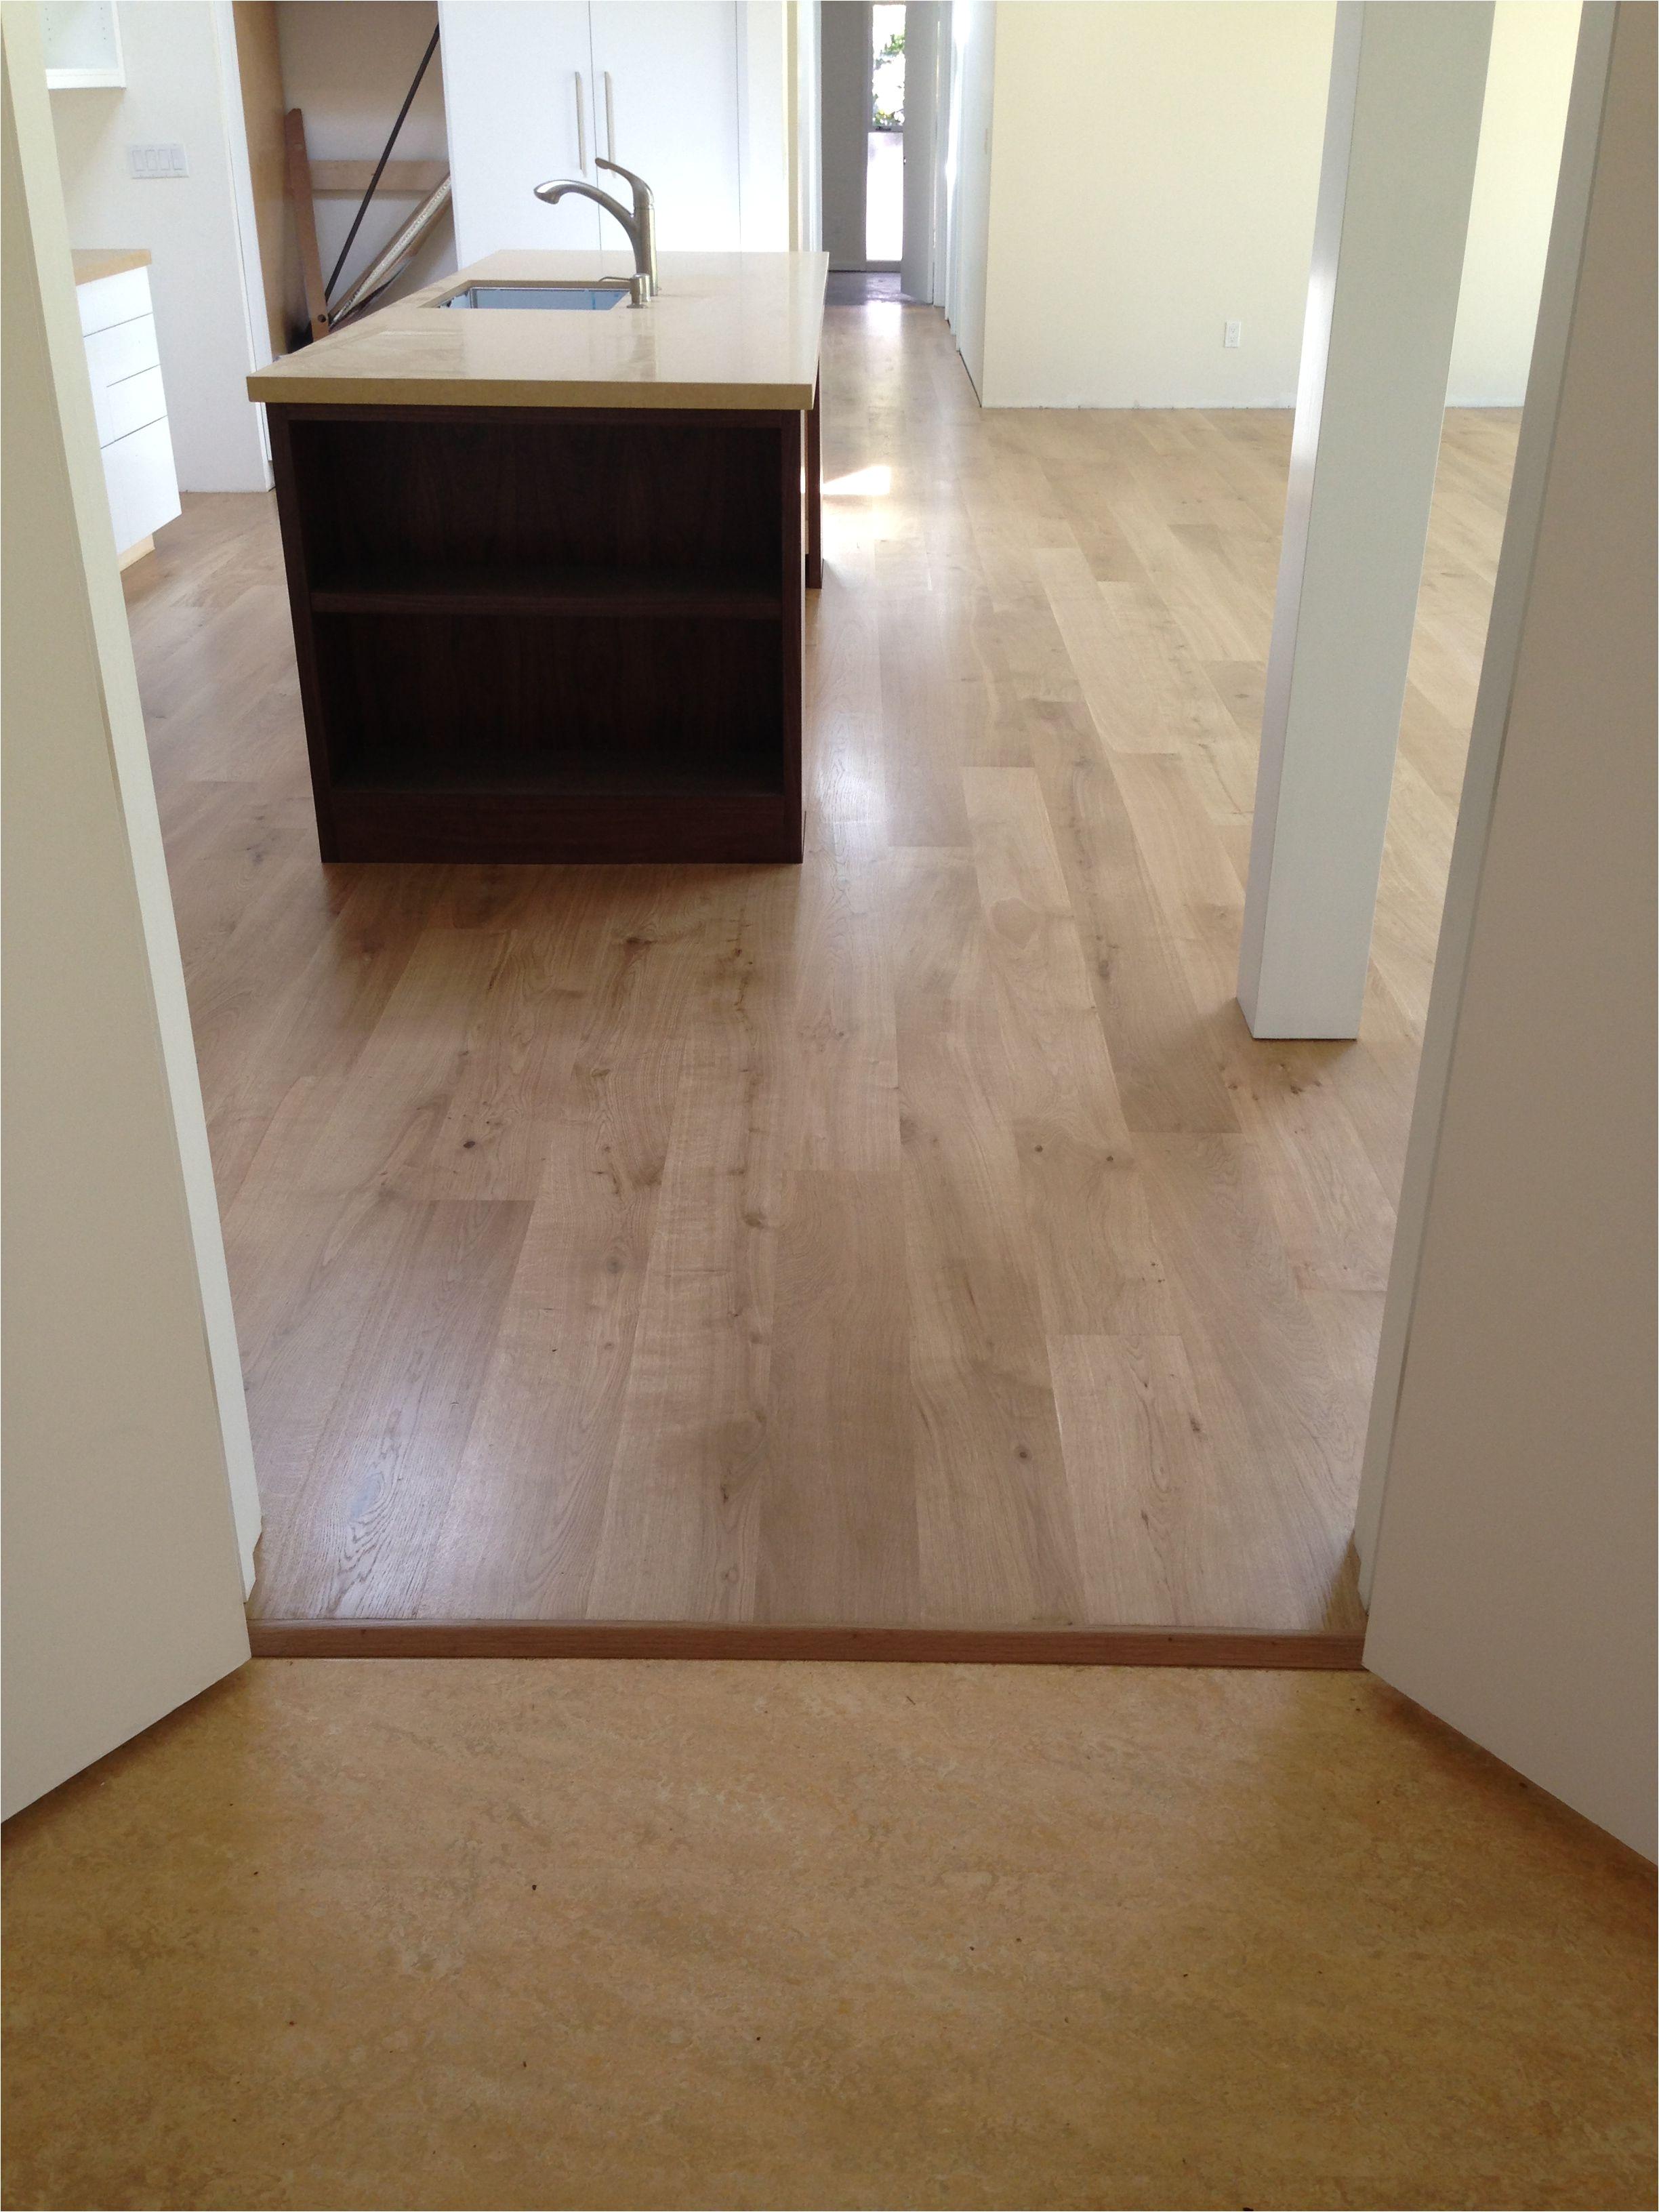 Bona Floor Products Marmoleum Cork Budding French White Oak Sanded and Finished with 3